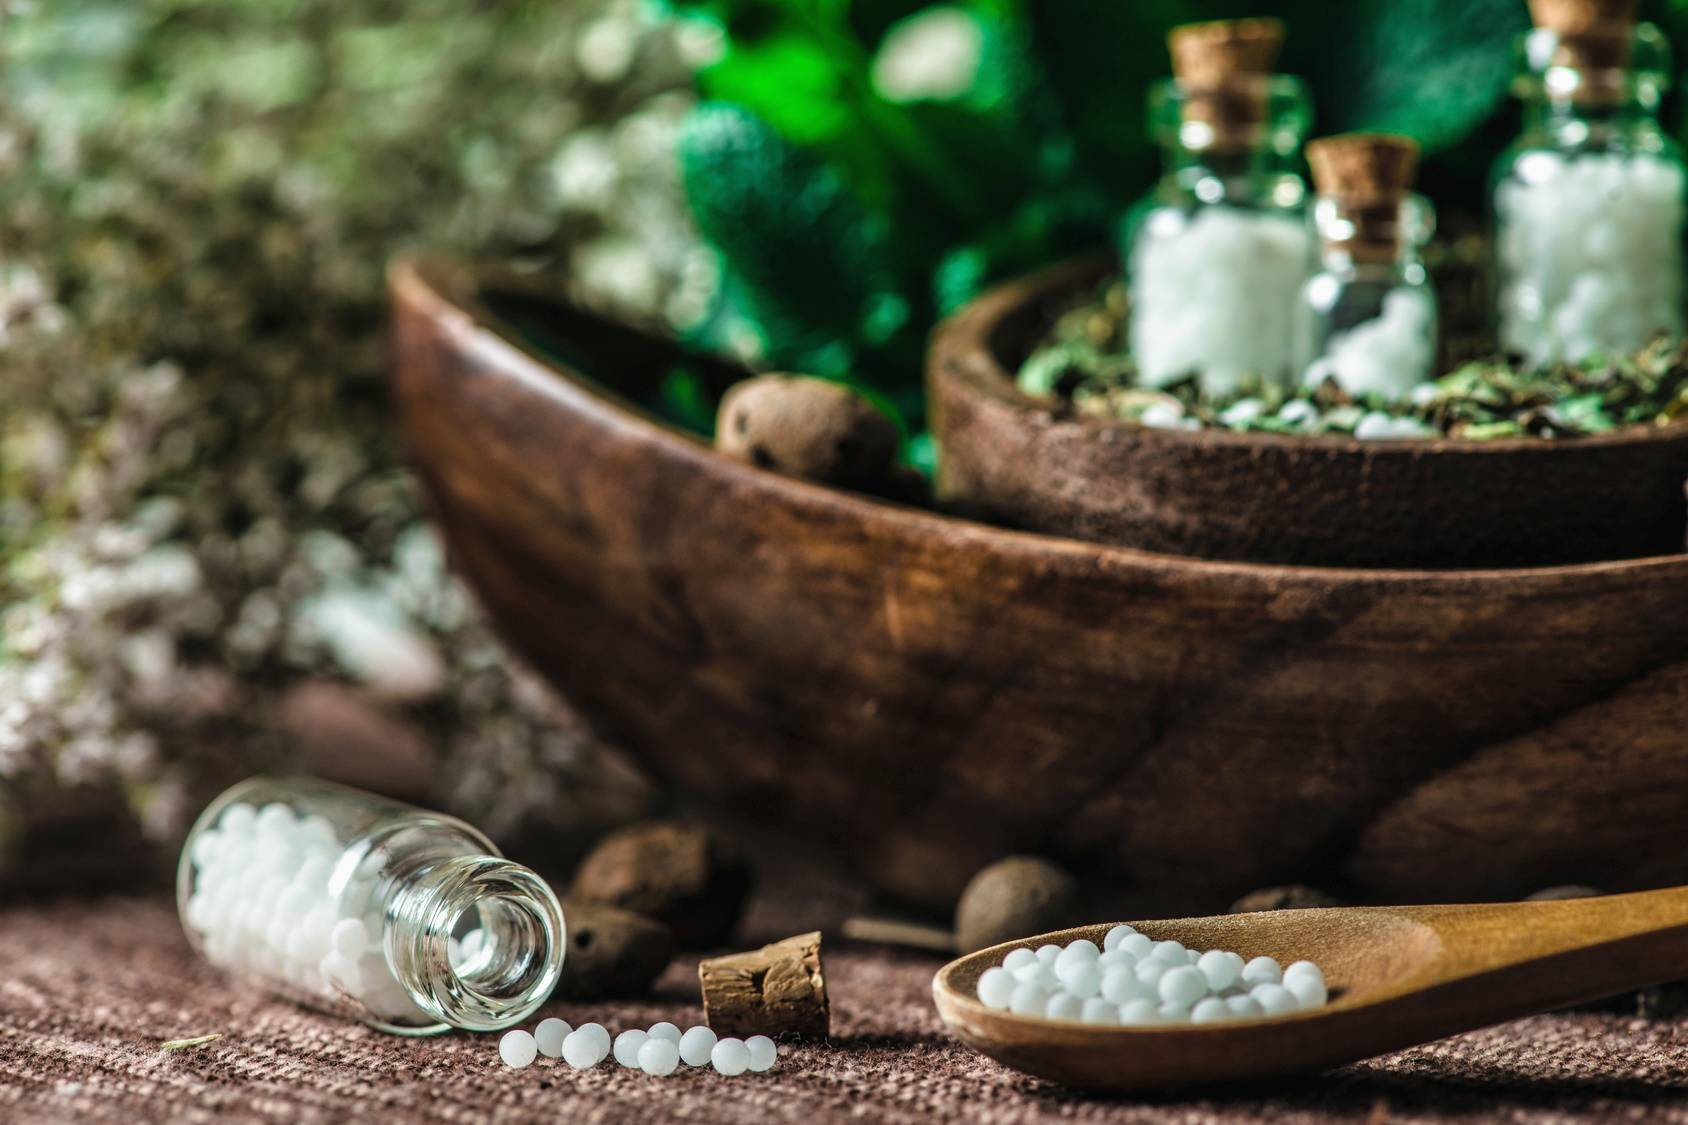 Leki homeopatyczne na hemoroidy - naturalne sposoby na hemoroidy.